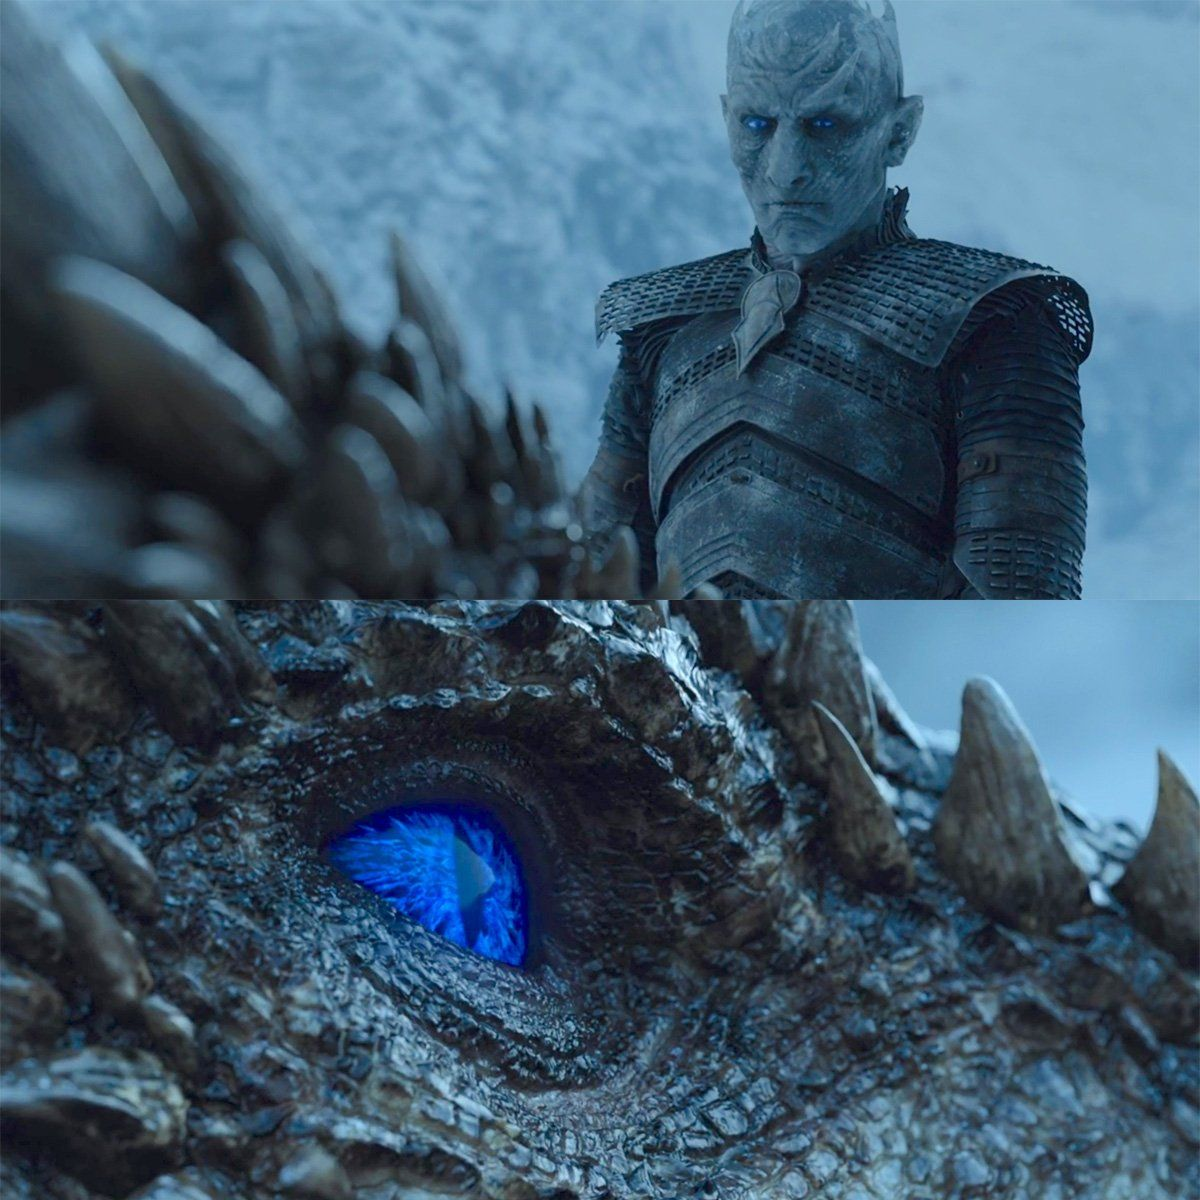 Game Of Thrones Viserion Night King Night King Ice Dragon Game Of Thrones Dragons